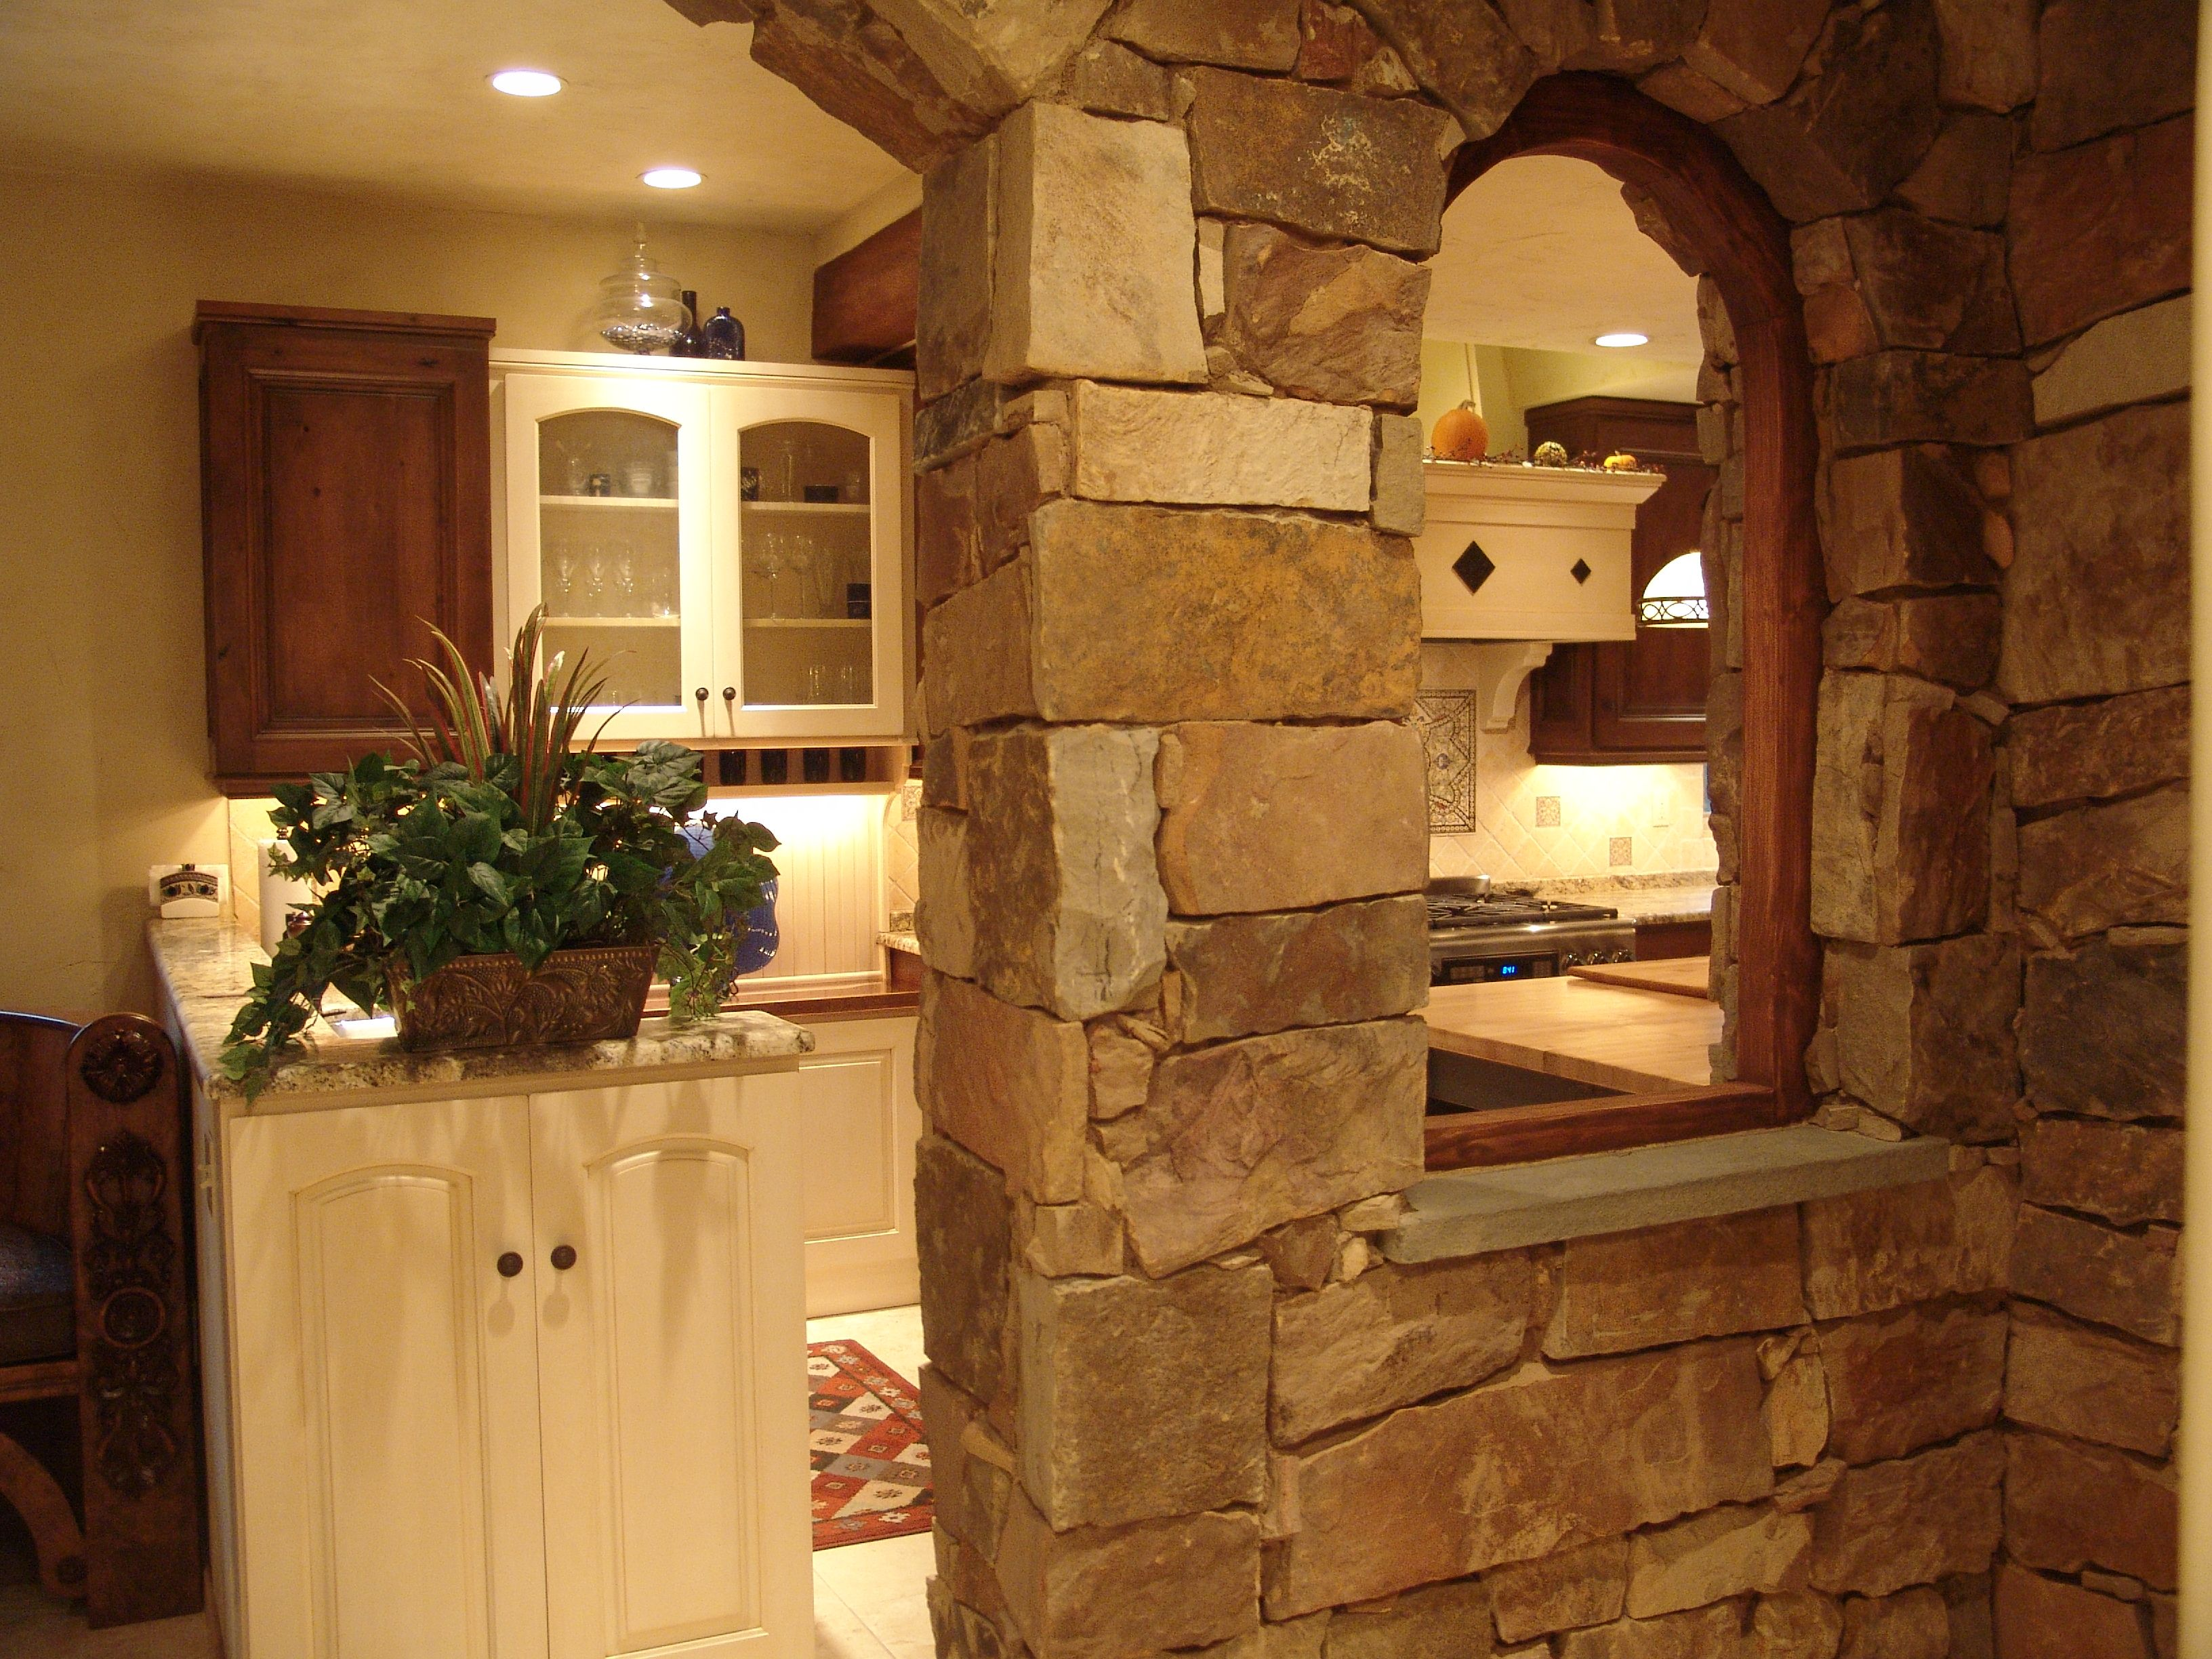 Rustikale esszimmerbeleuchtung ideen kitchen  kitchen  orchard hill rd canton ct  pinterest